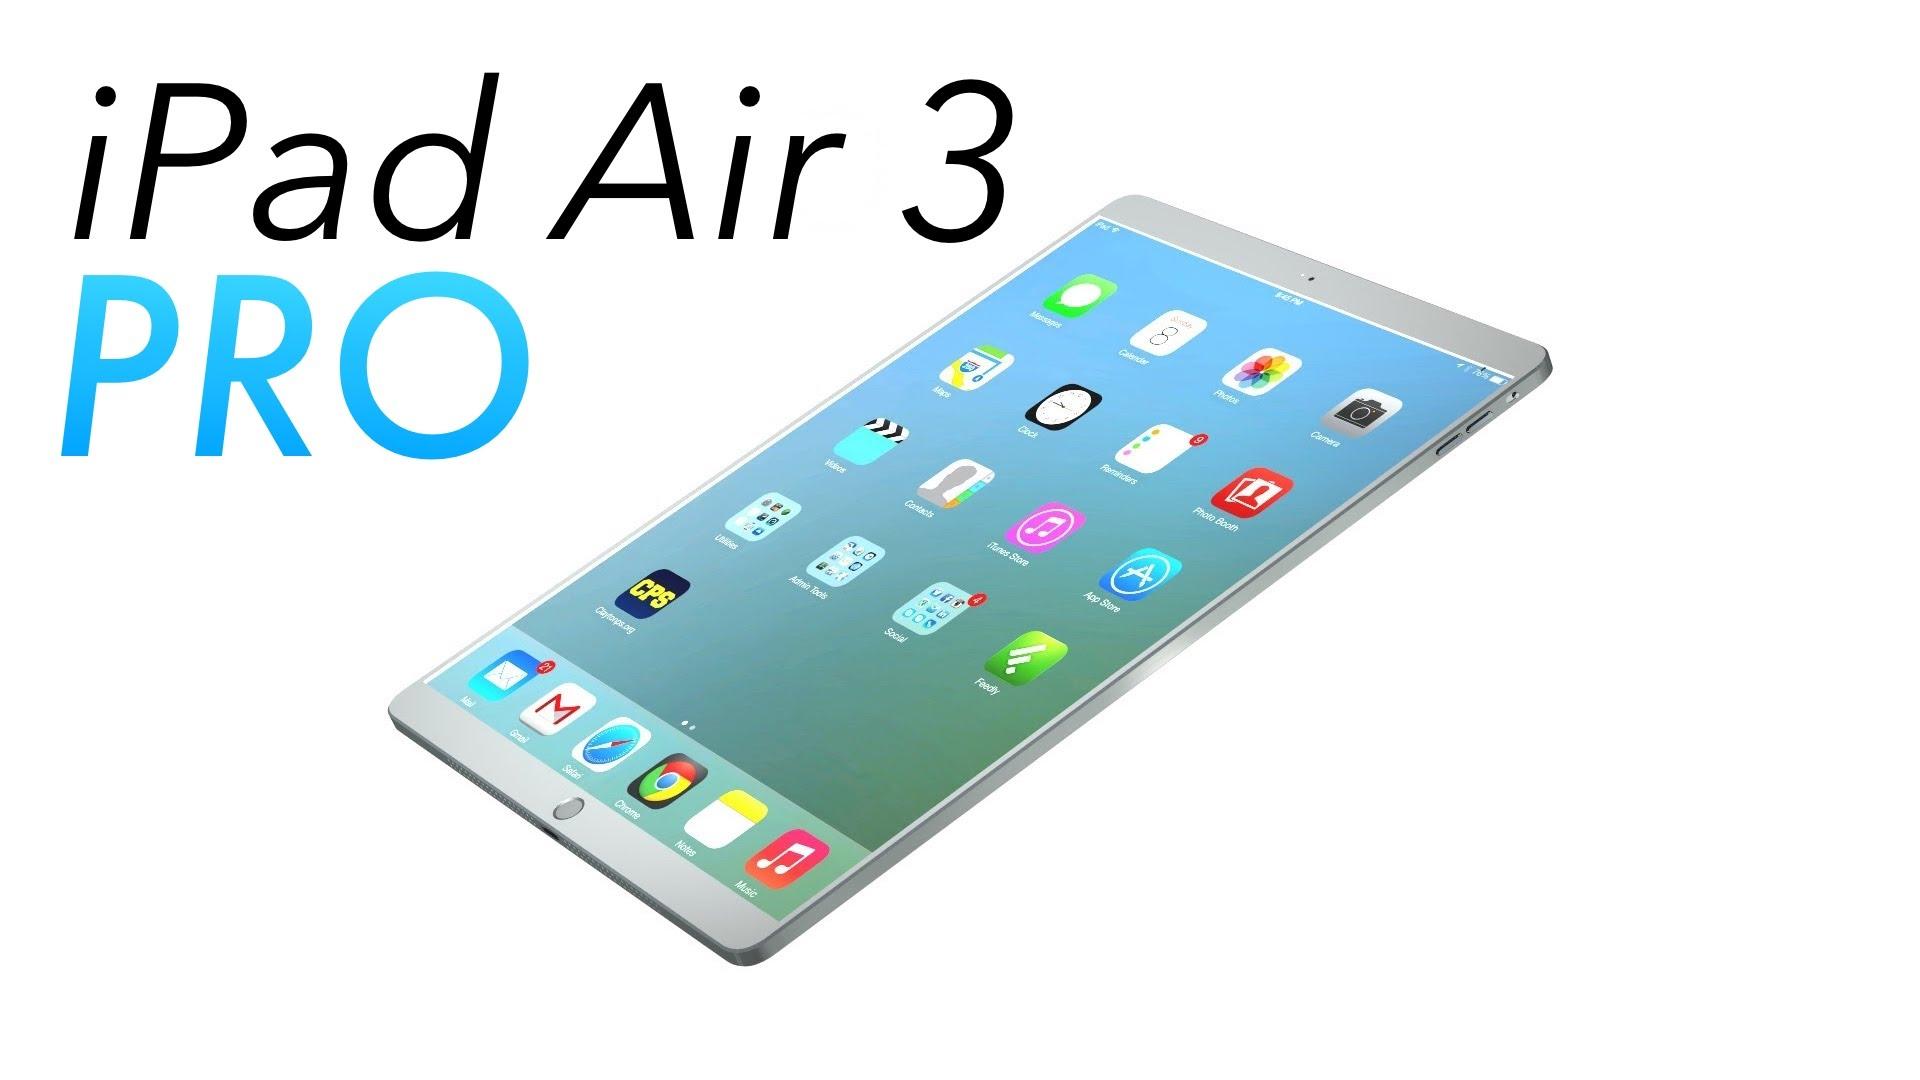 iPad Air 3 Pro